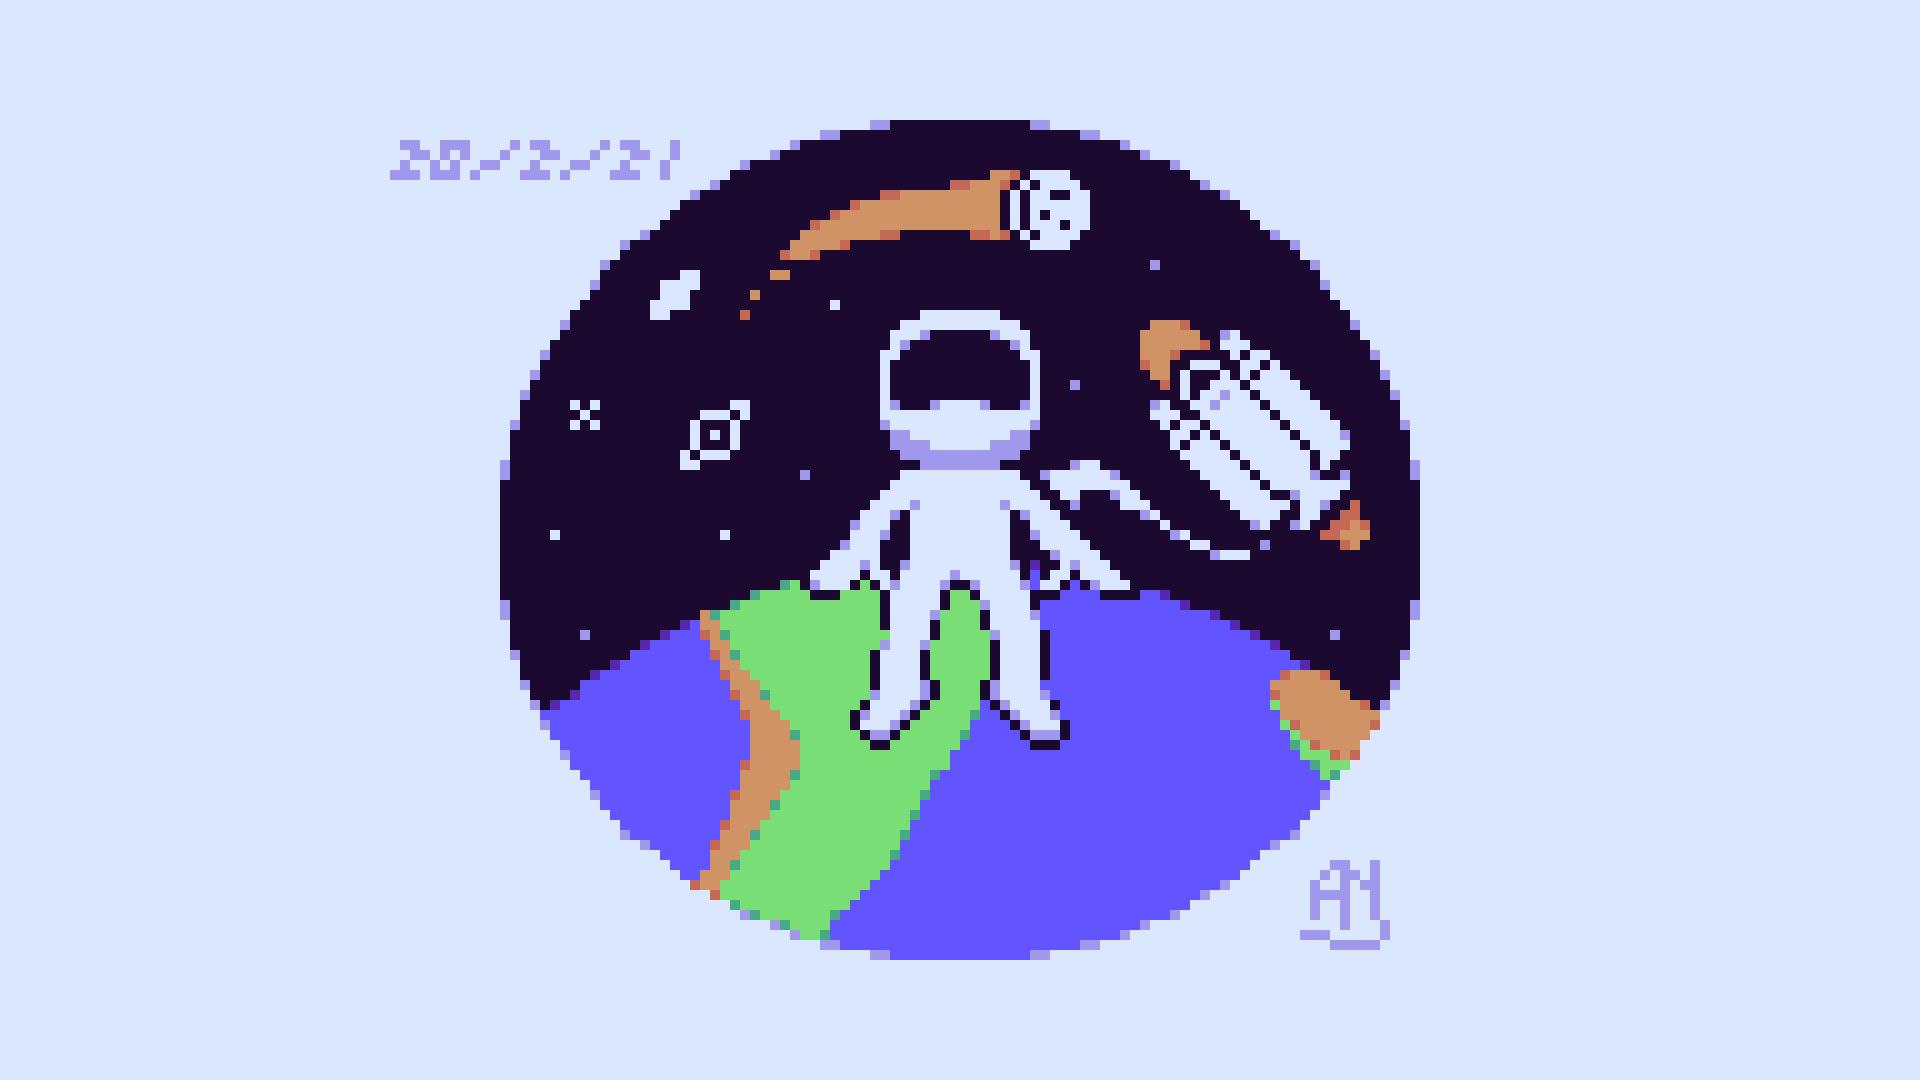 AstronautMoon